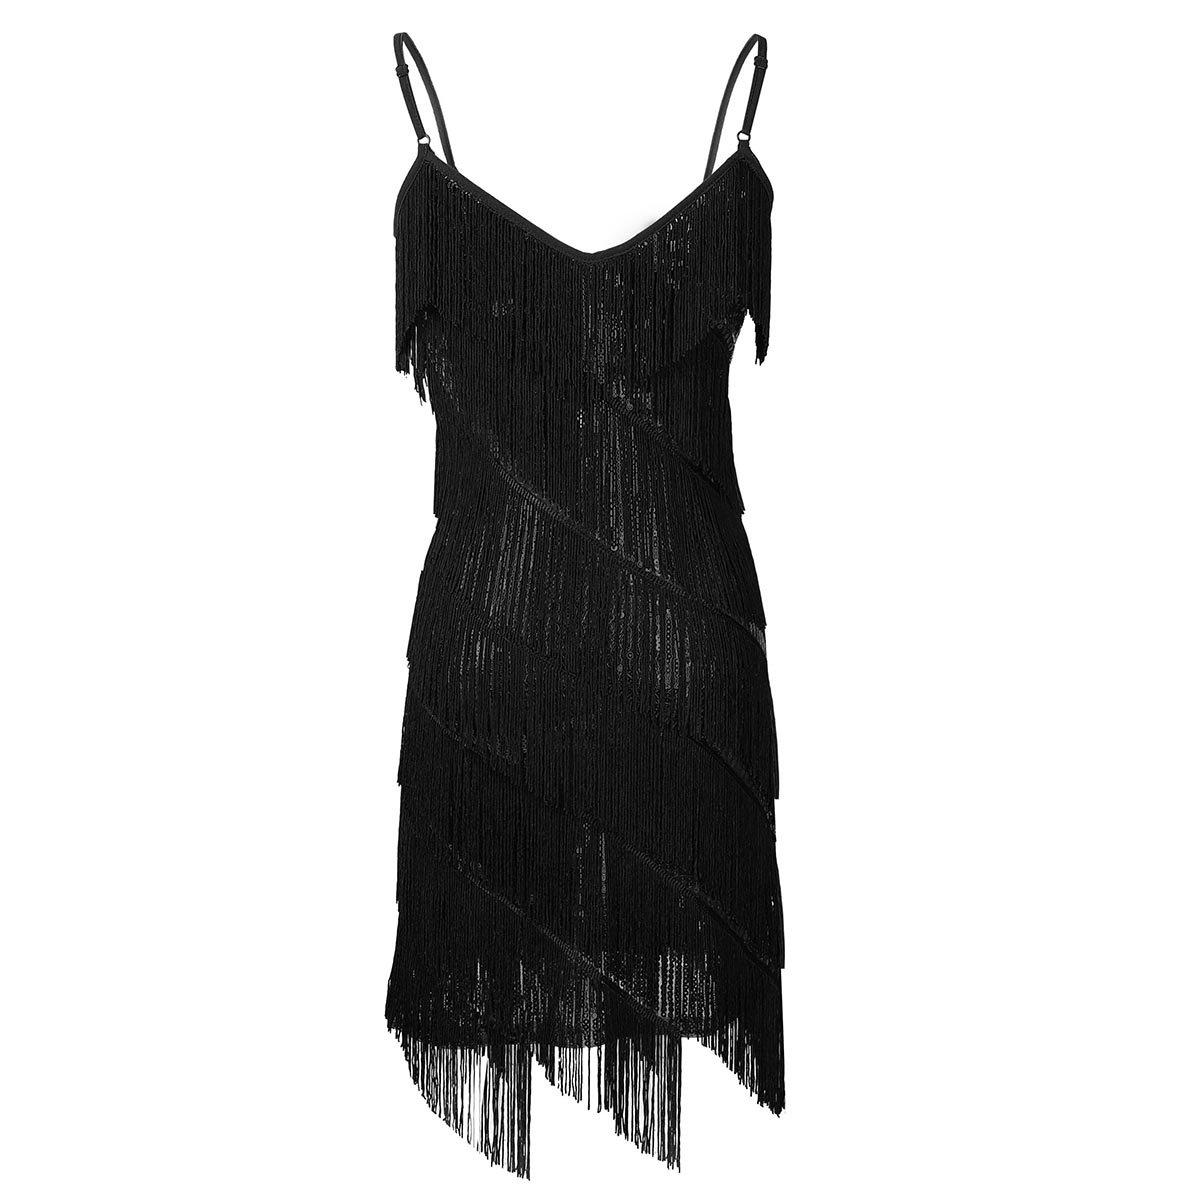 Freebily Womens 1920s Sequin Spaghetti Straps Tassels Fringe Flapper Dress Party Latin Dancewear